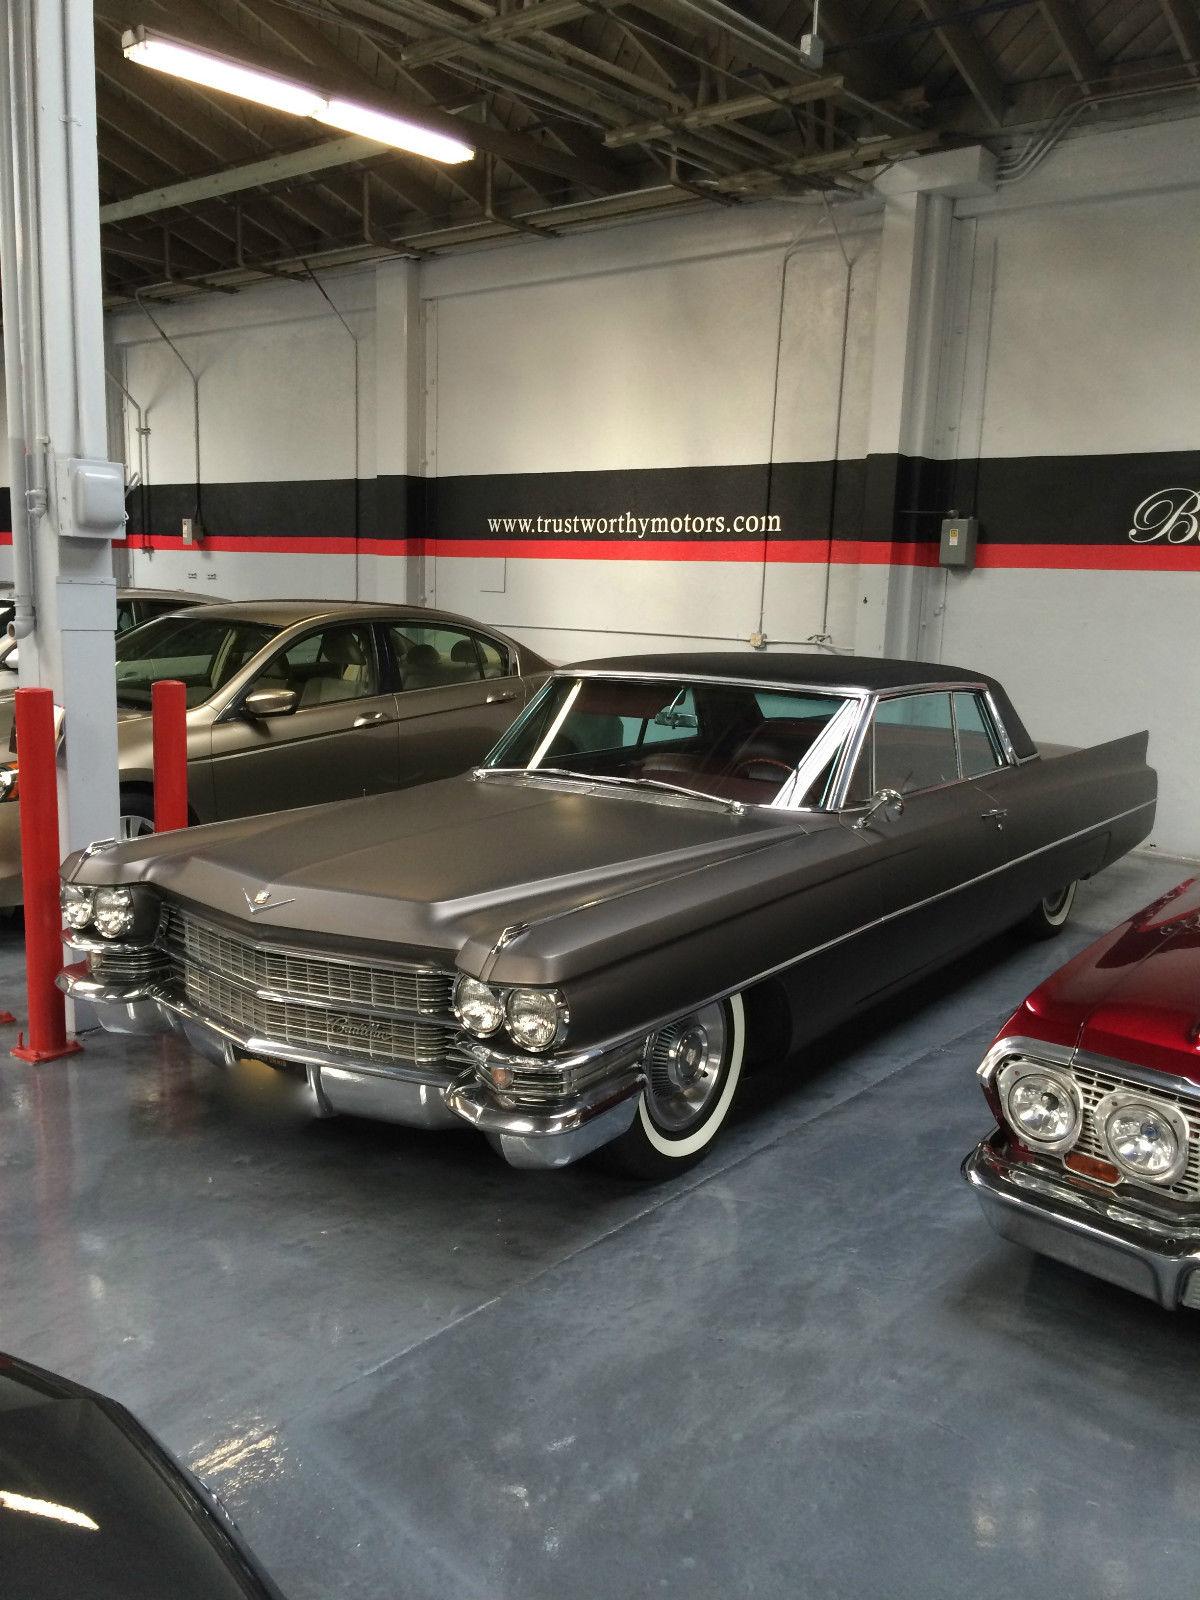 1963 Cadillac Coupe Deville Original 2 Door Coupe Silver